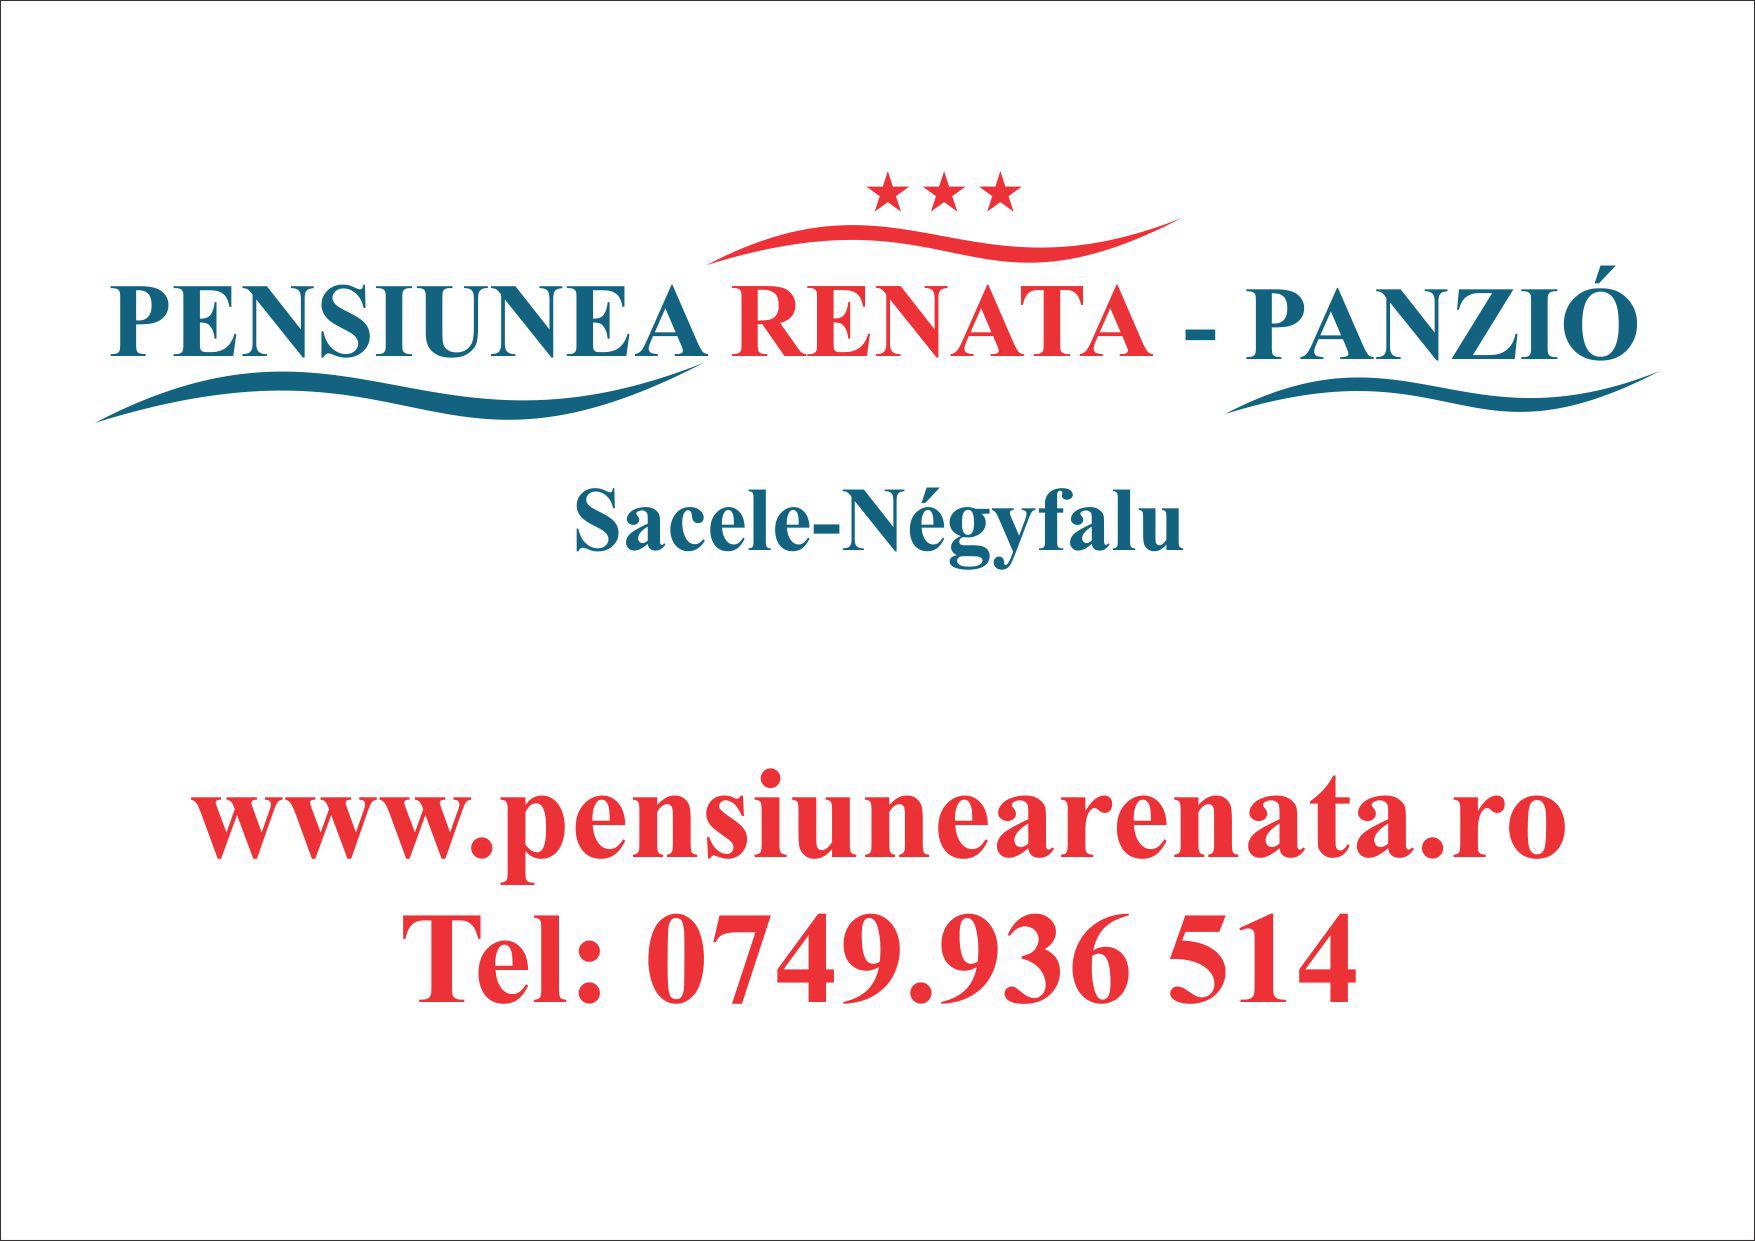 PENSIUNEA RENATA